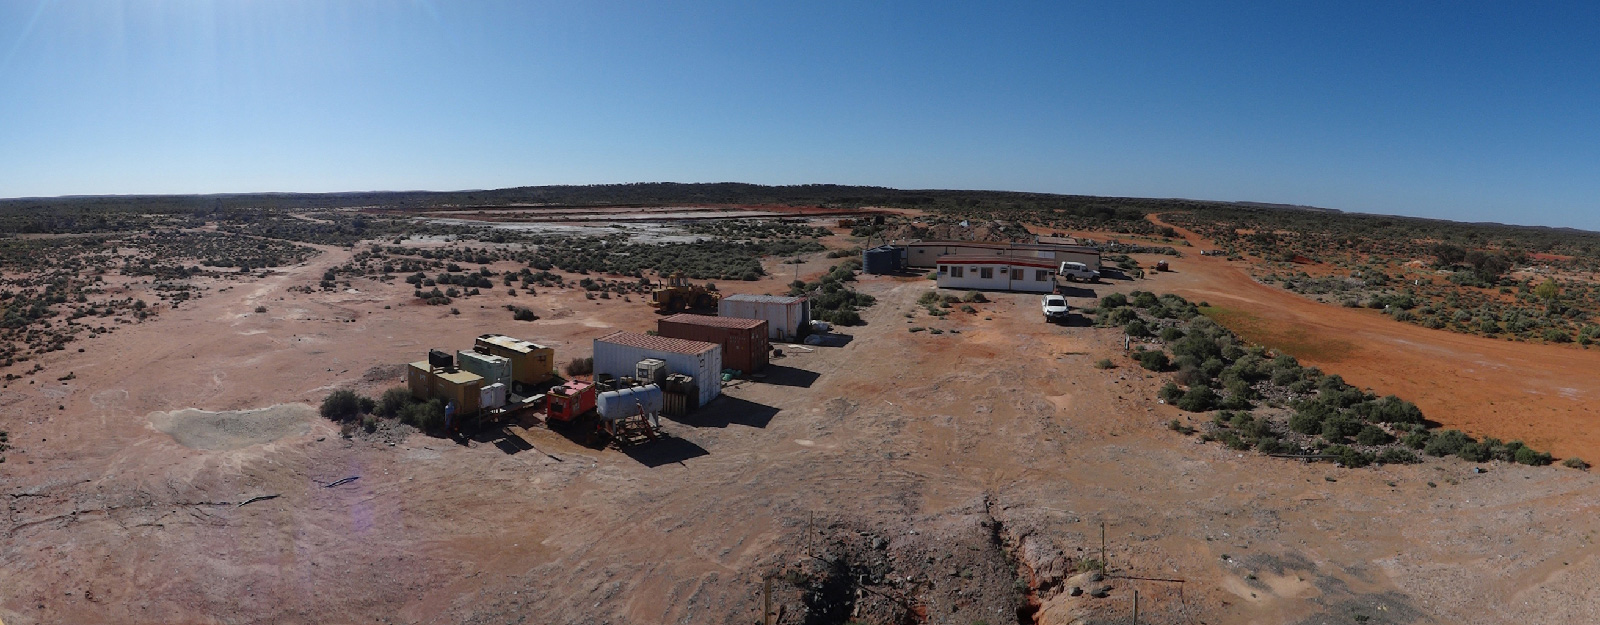 bk-panorama01_web2